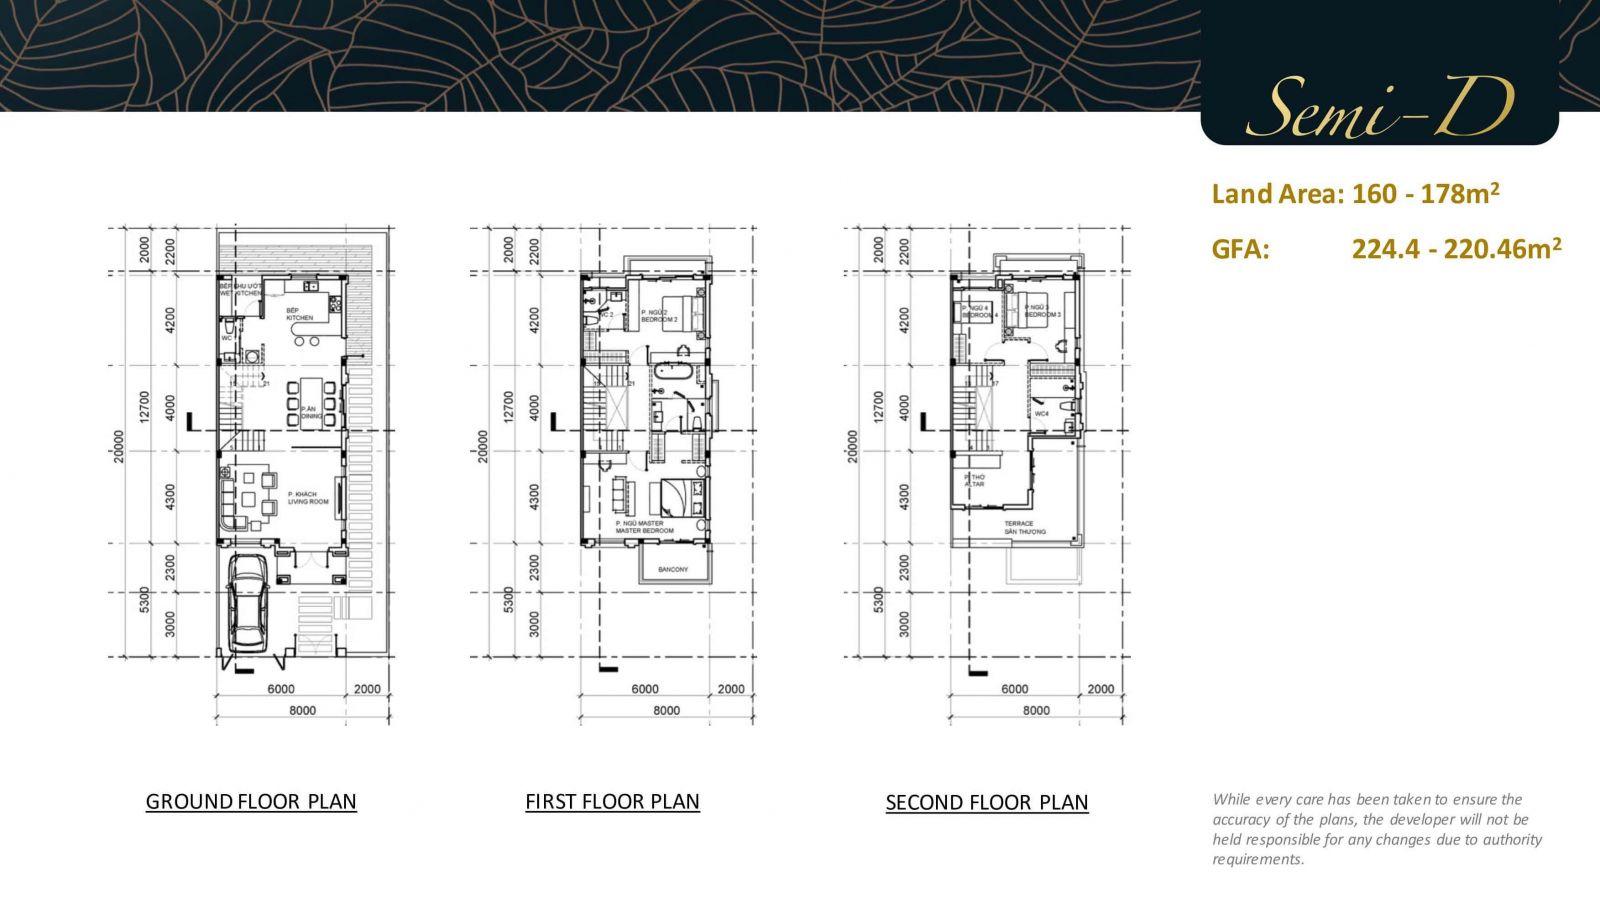 Thiết kế biệt thự song lập swanbay la maison